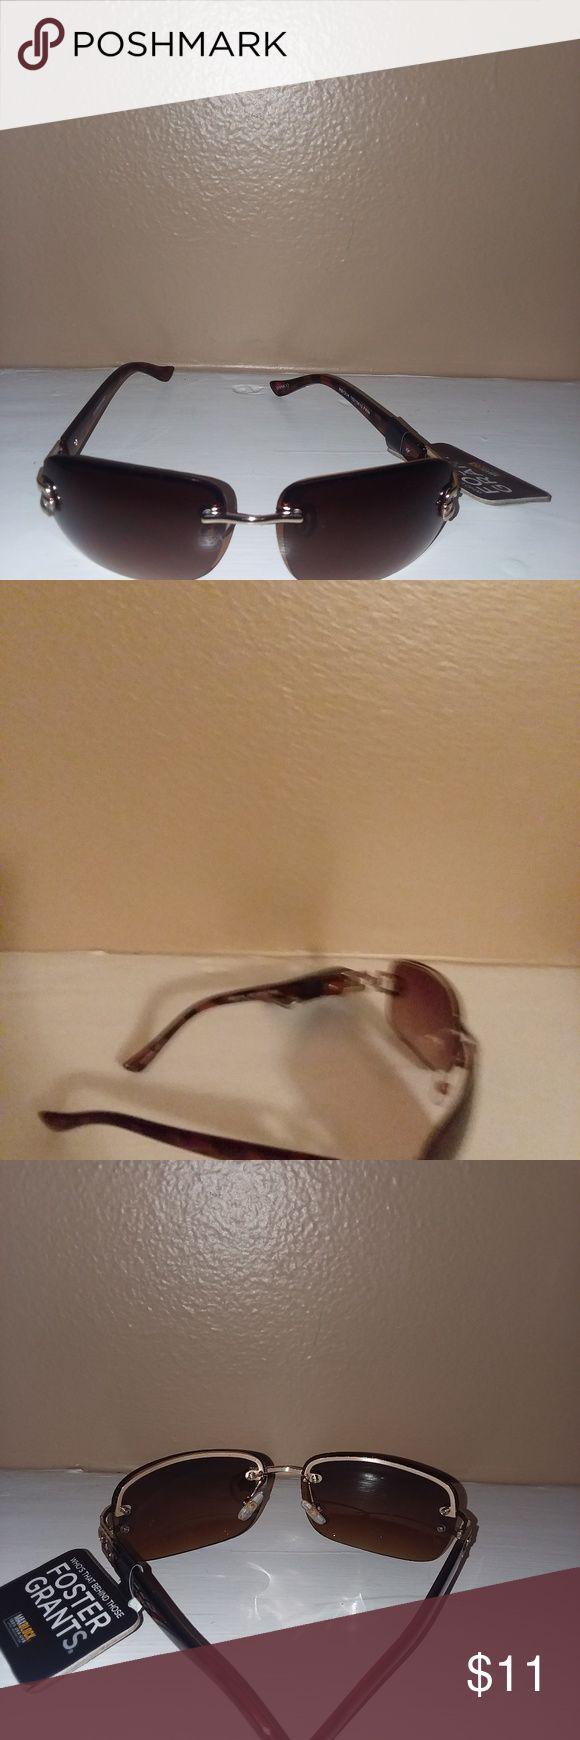 Foster Grant Sunglasses Foster Grant Max Block 100% UVA protection.  Comfortable fit new with tag. Foster Grant Accessories Sunglasses